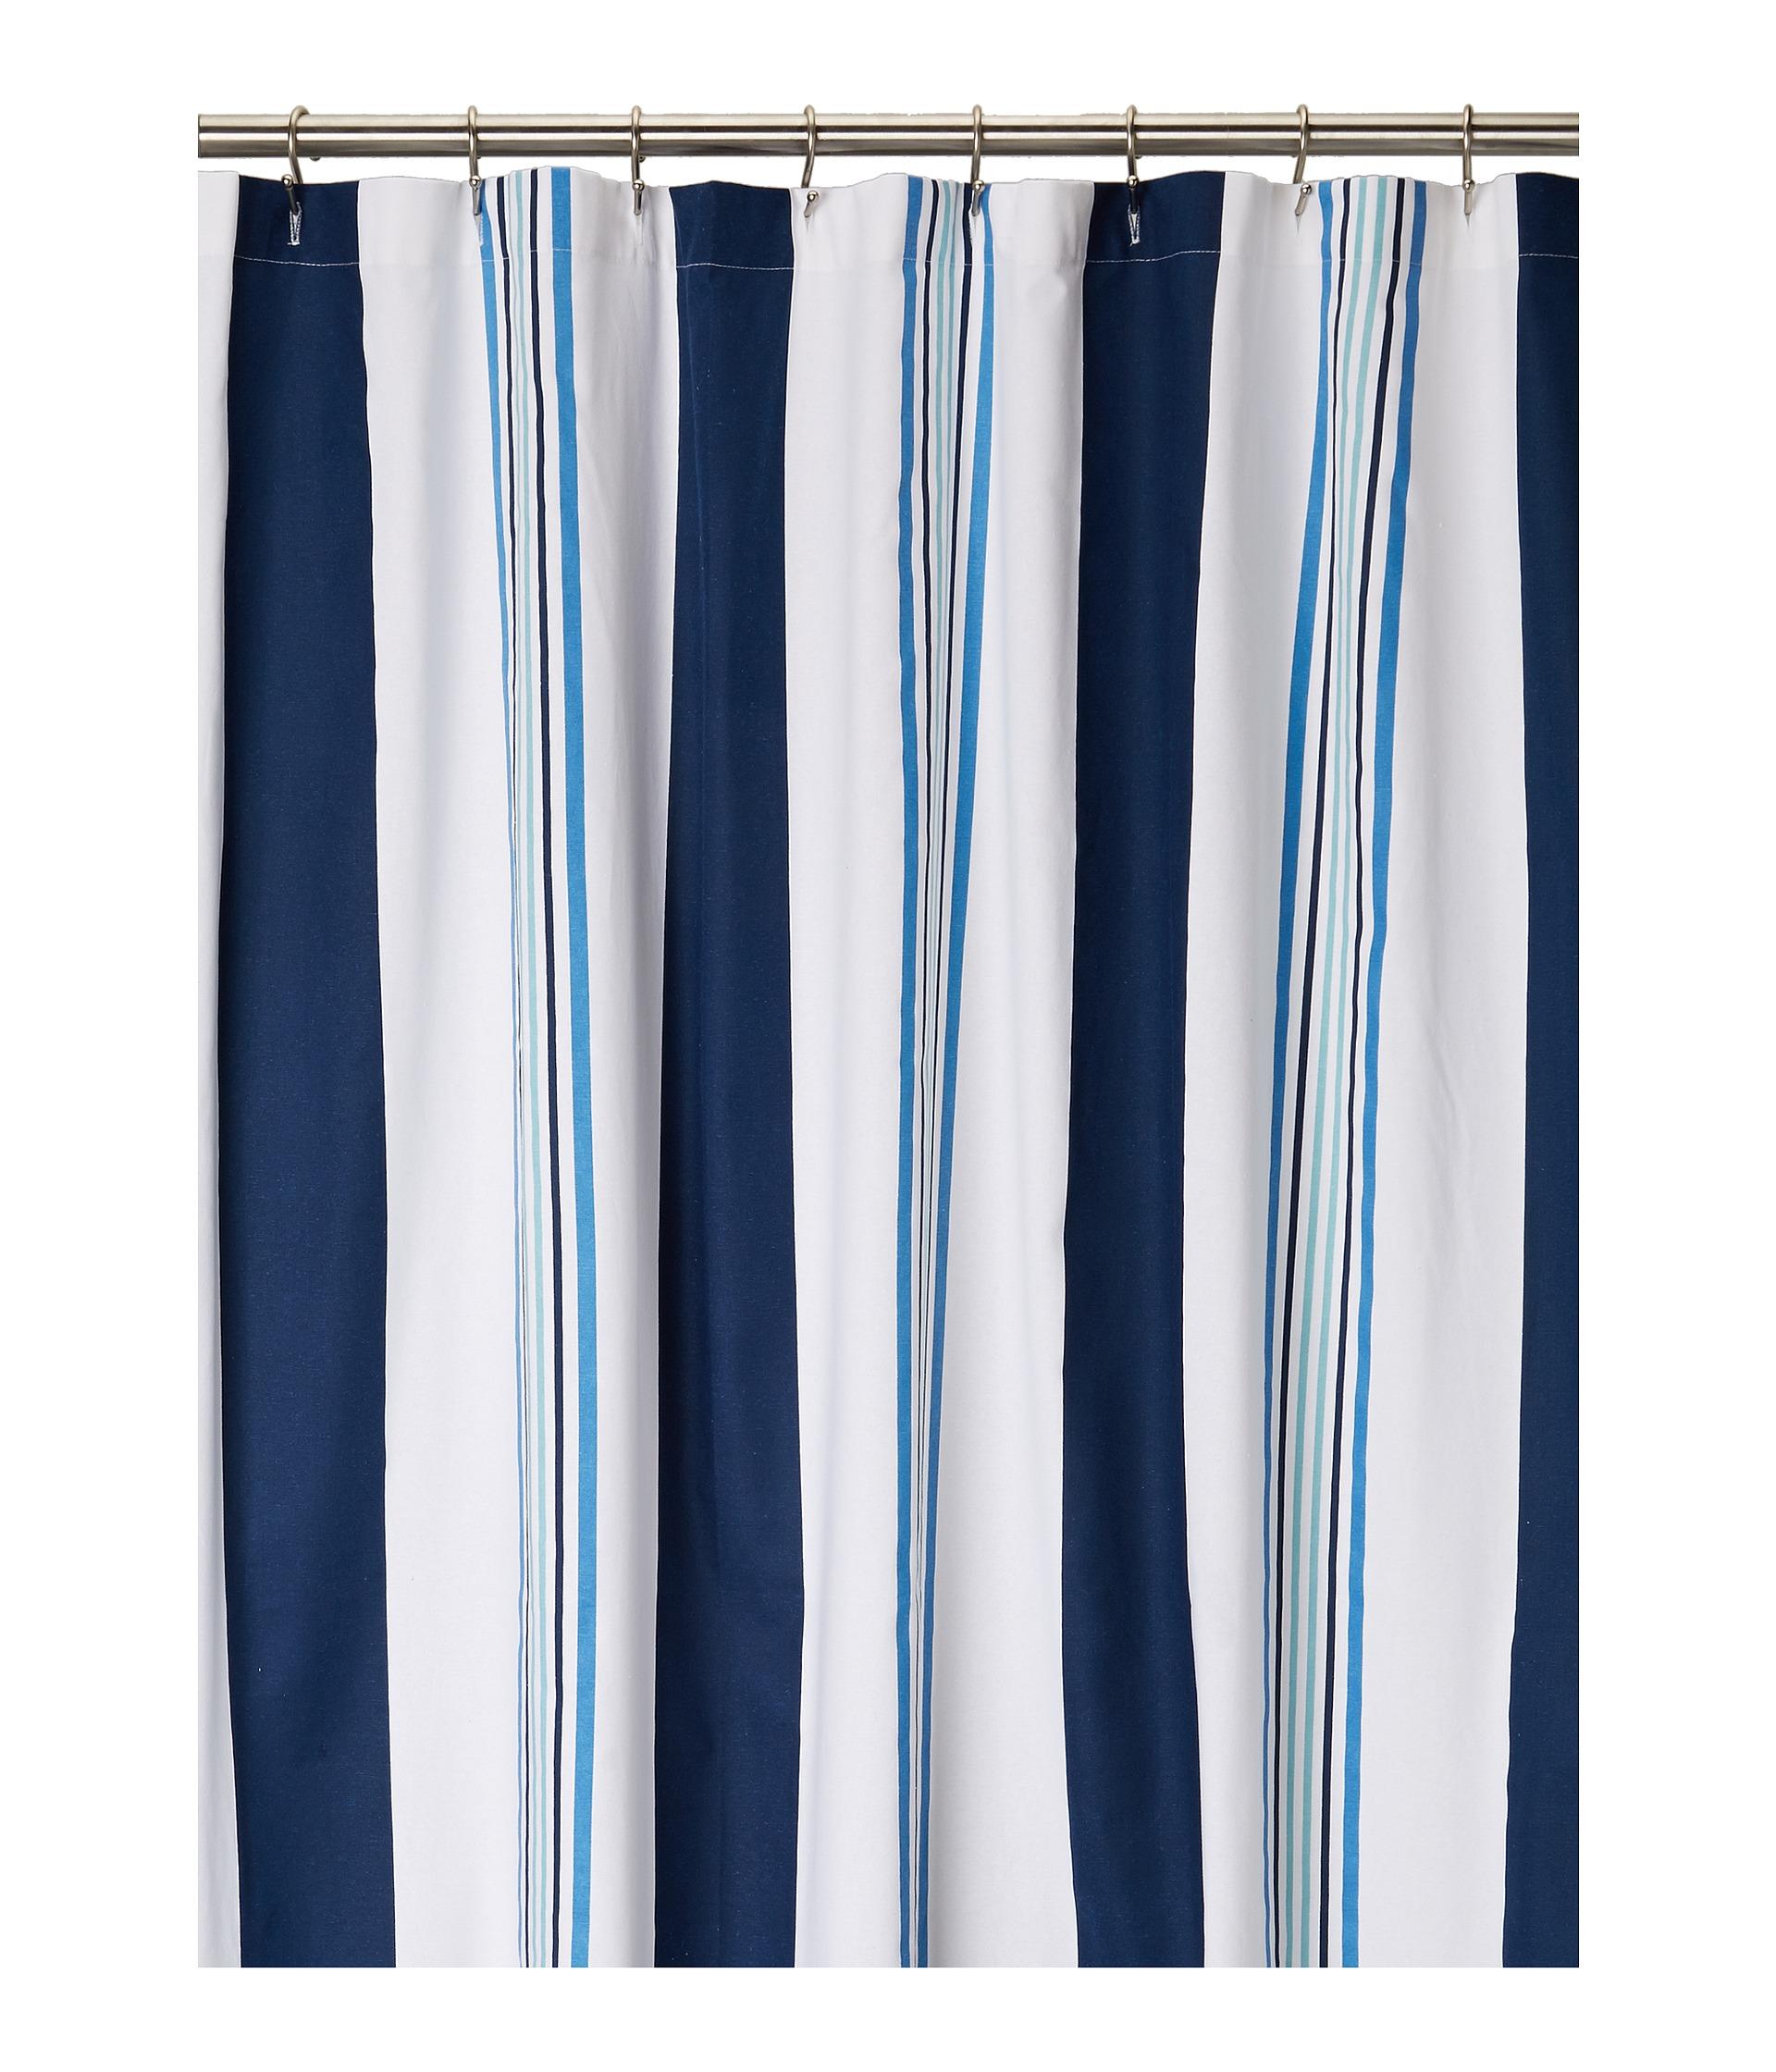 Kassatex Cabana Stripe Shower Curtain at Zappos